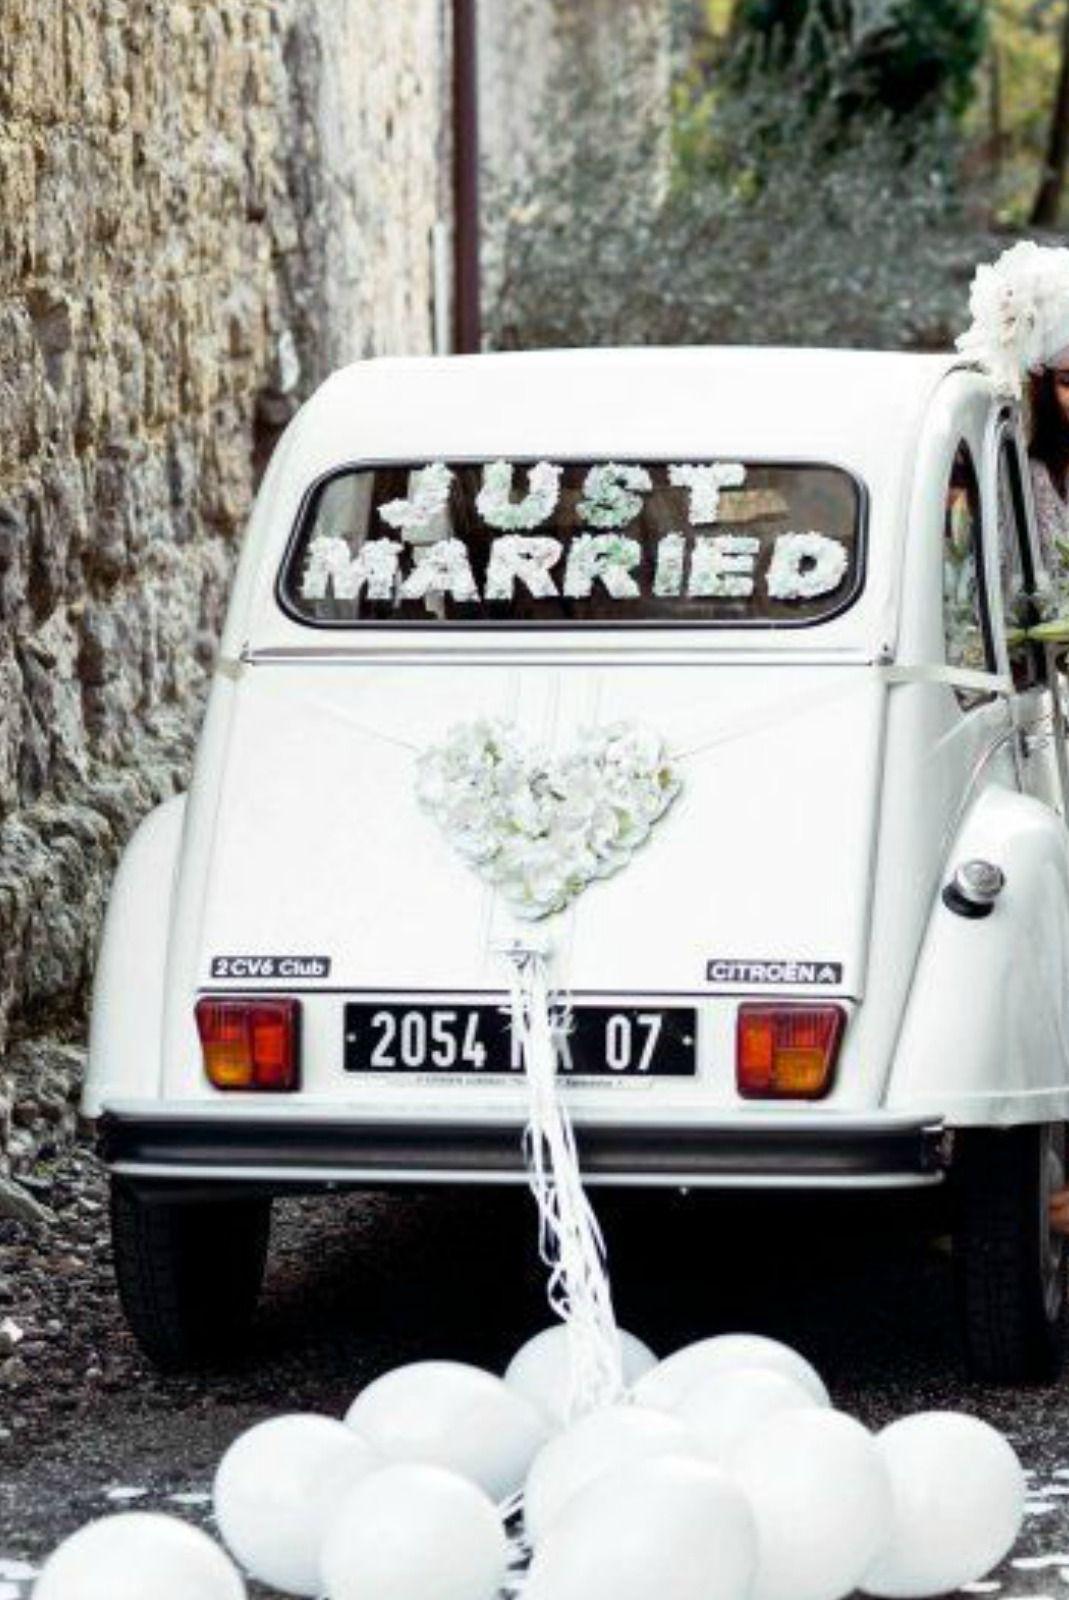 Wedding car decoration ideas  Pin by lucia on decoracion  Pinterest  Wedding cars Wedding and